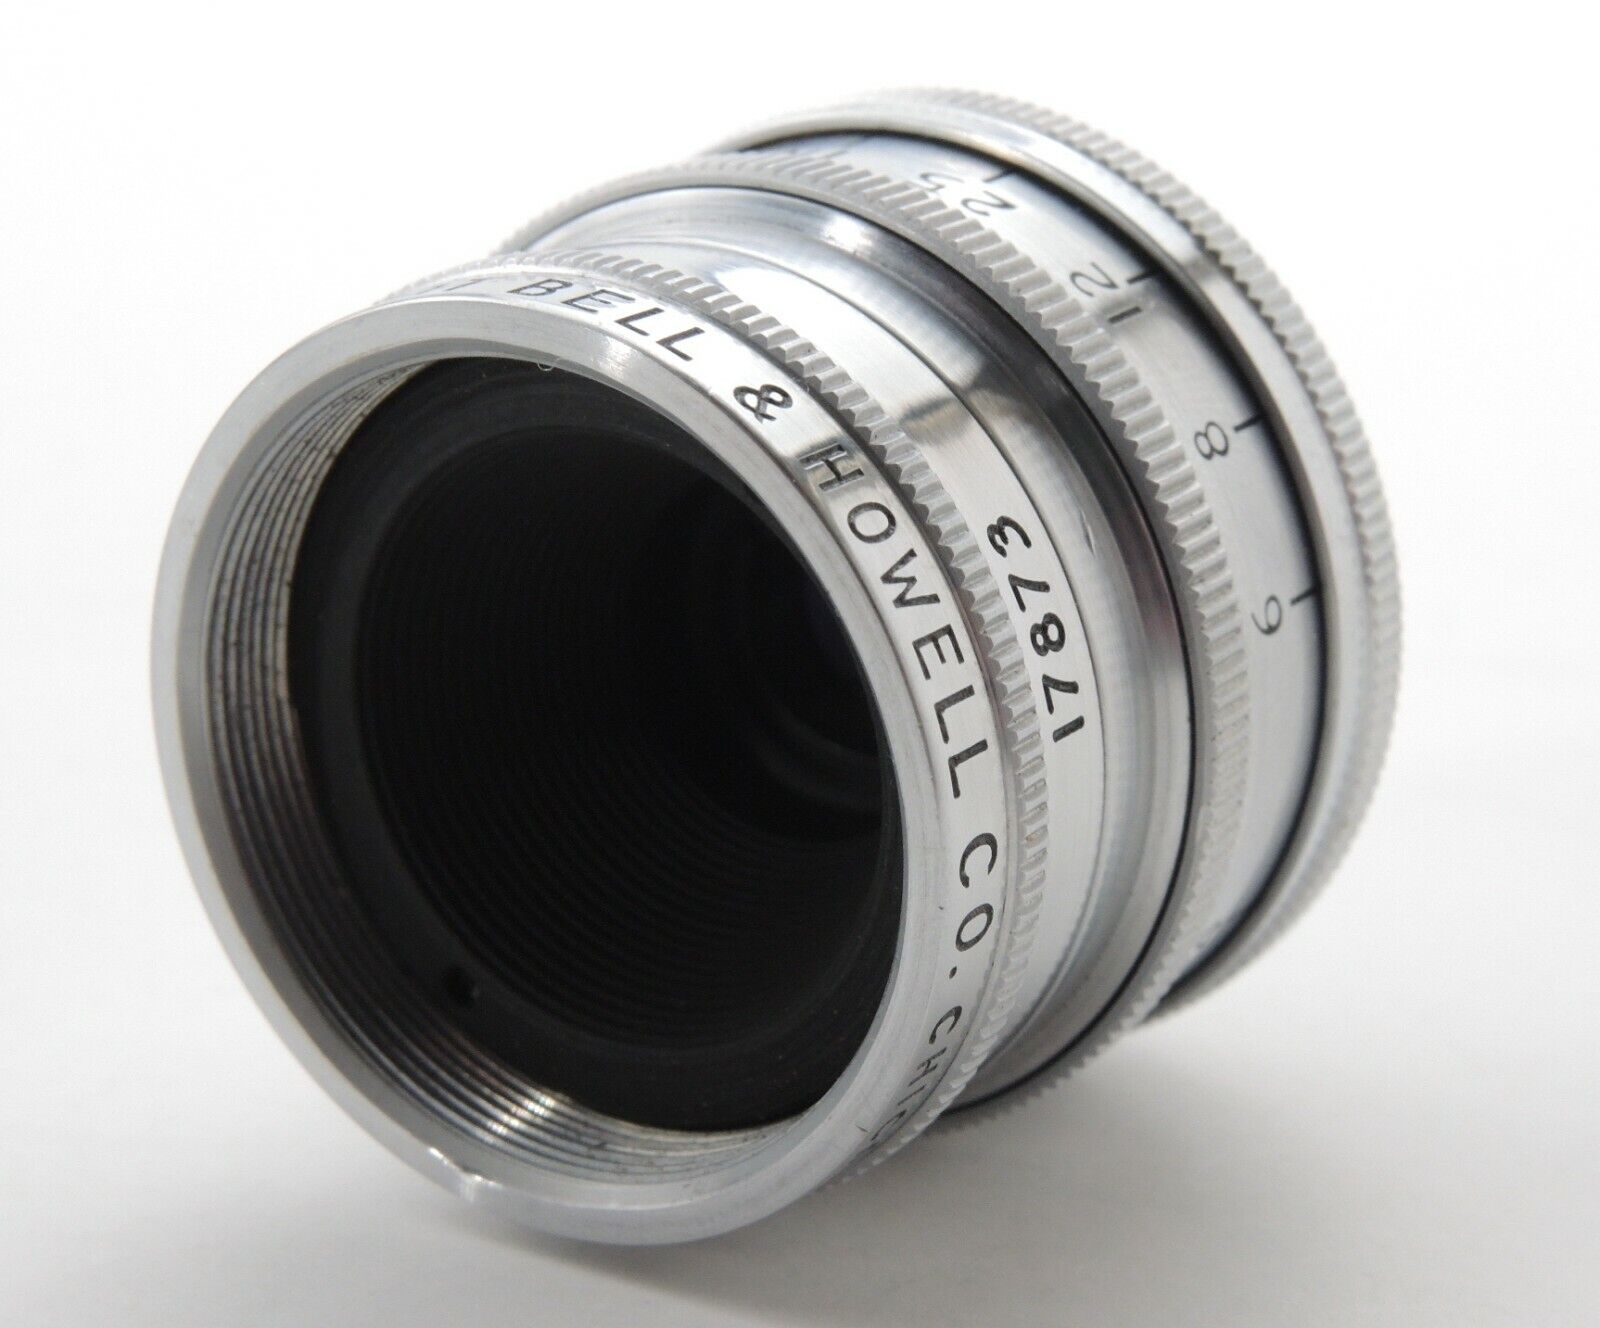 BELL HOWELL SUPER COMAT 0.7 INCH 17mm F2.5 C MOUNT LENS BOLEX COOKE ANGENIEUX - $29.99